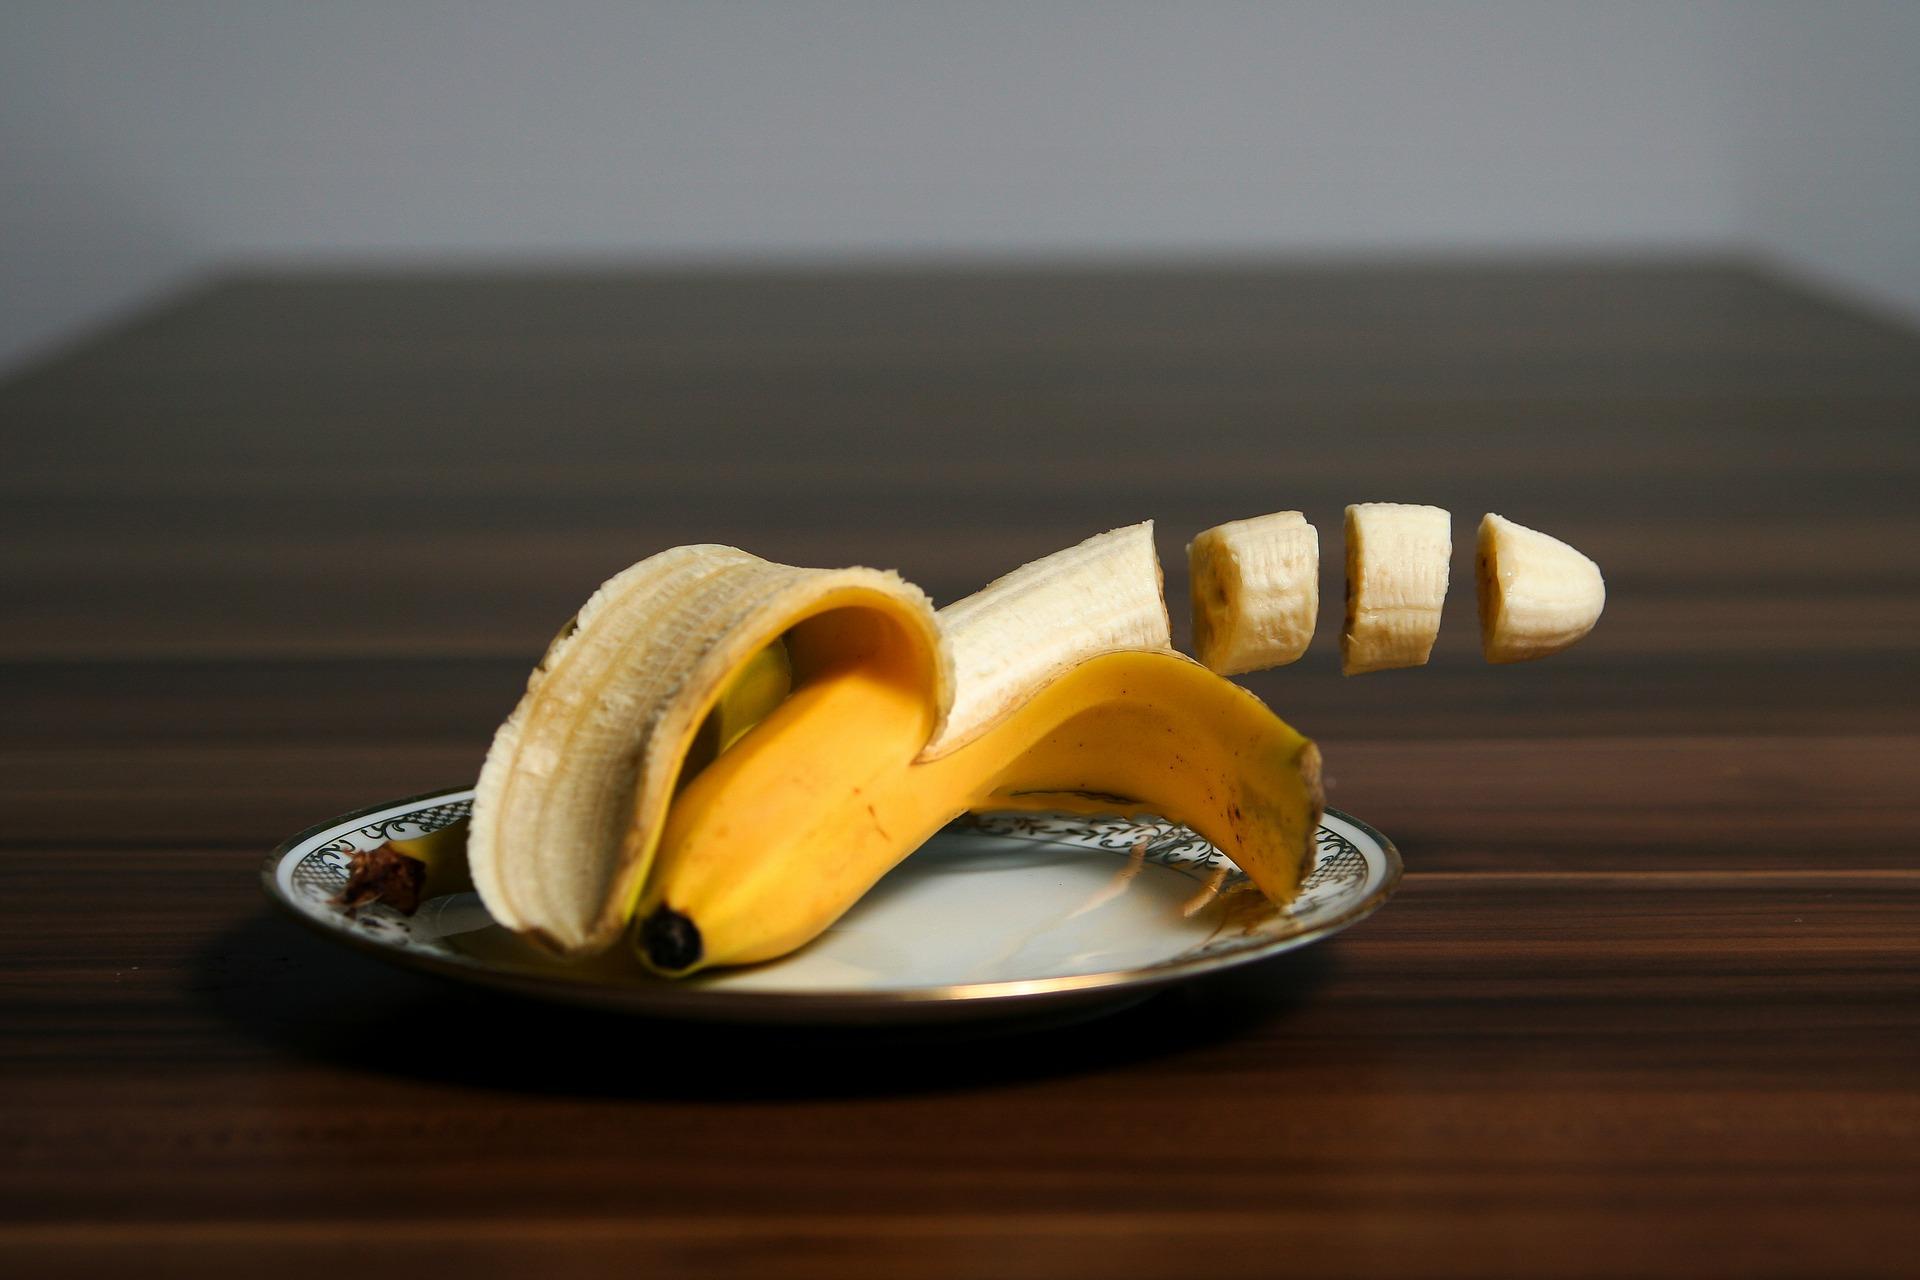 plátano r4t agap la palma